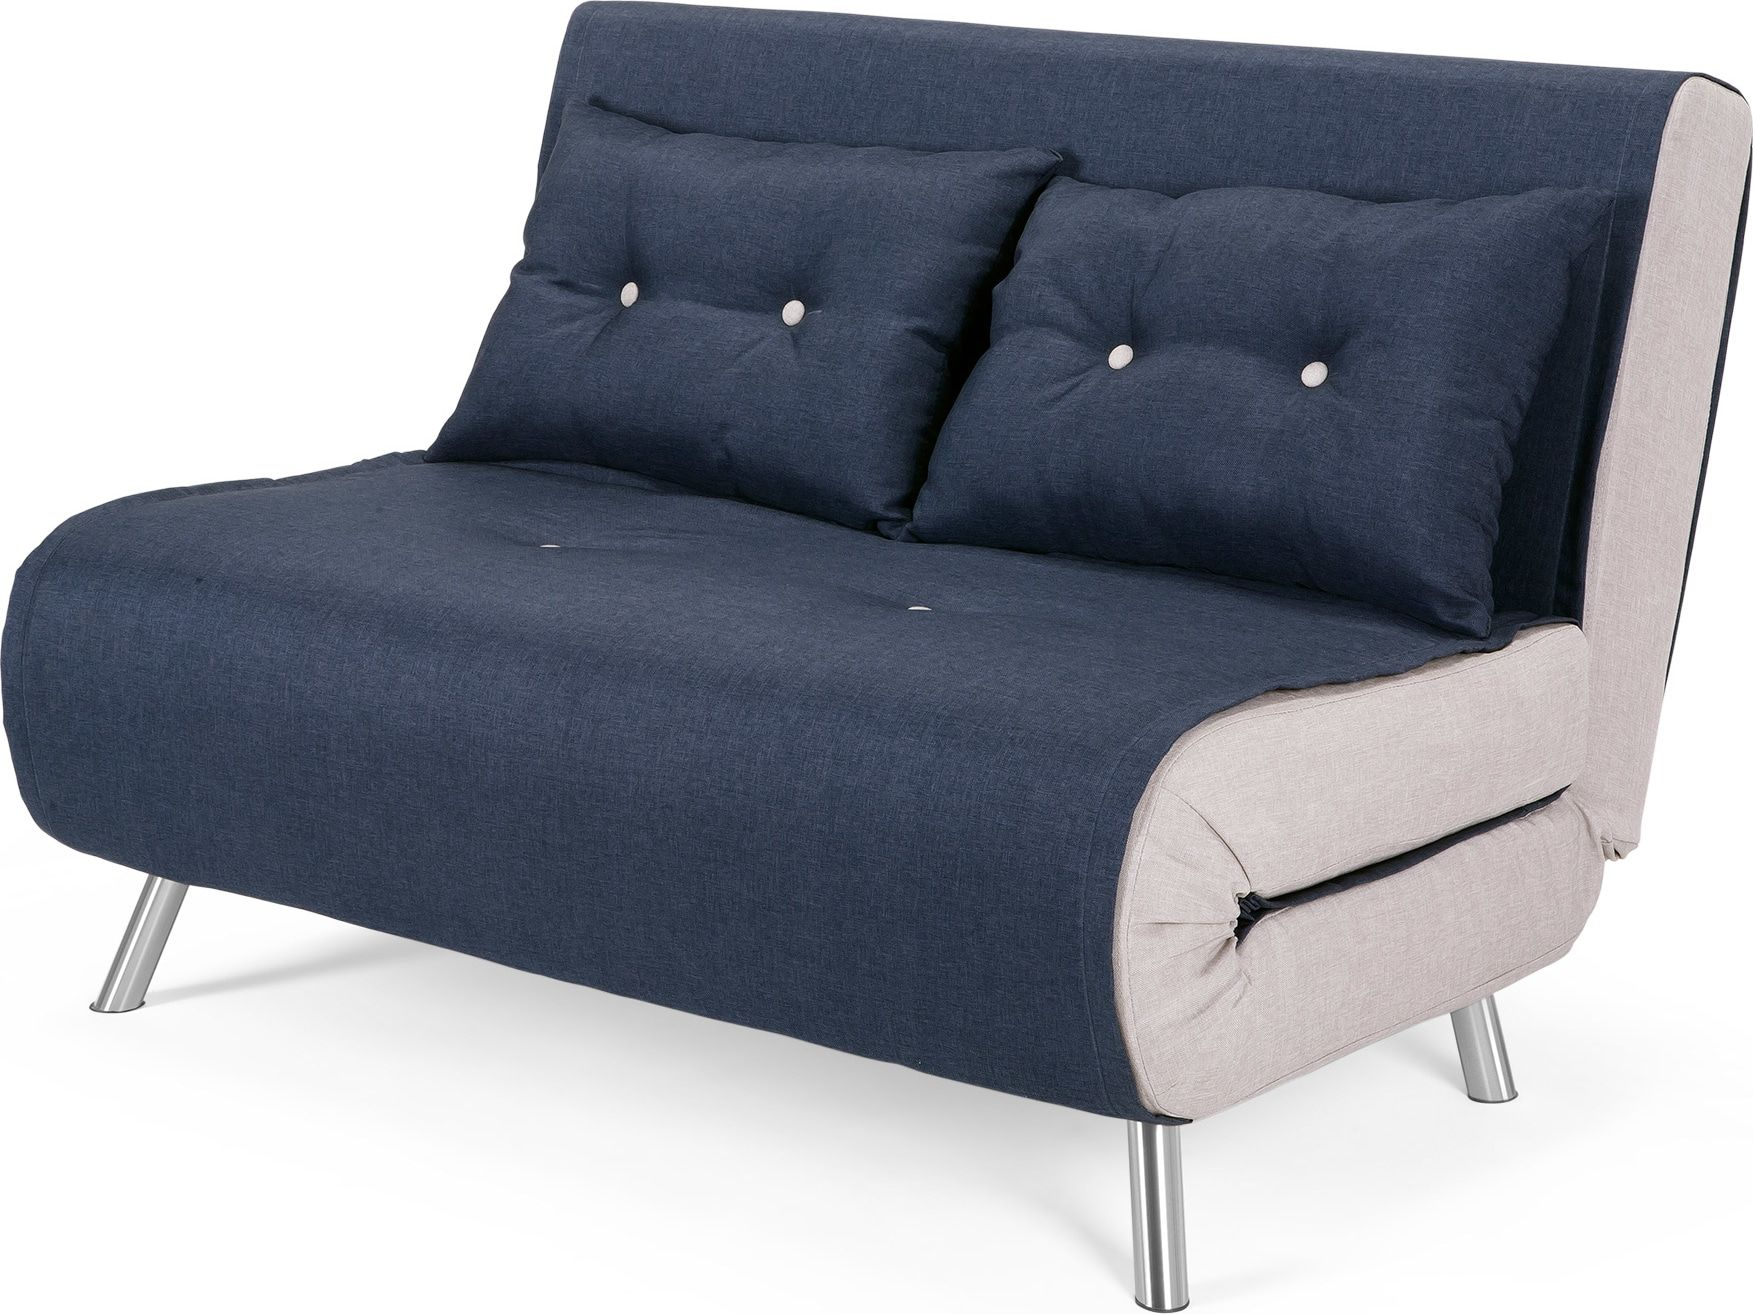 Made Quartz Blue Sofa Bed In 2020 Small Sofa Sofa Bed Australia Sofa Bed